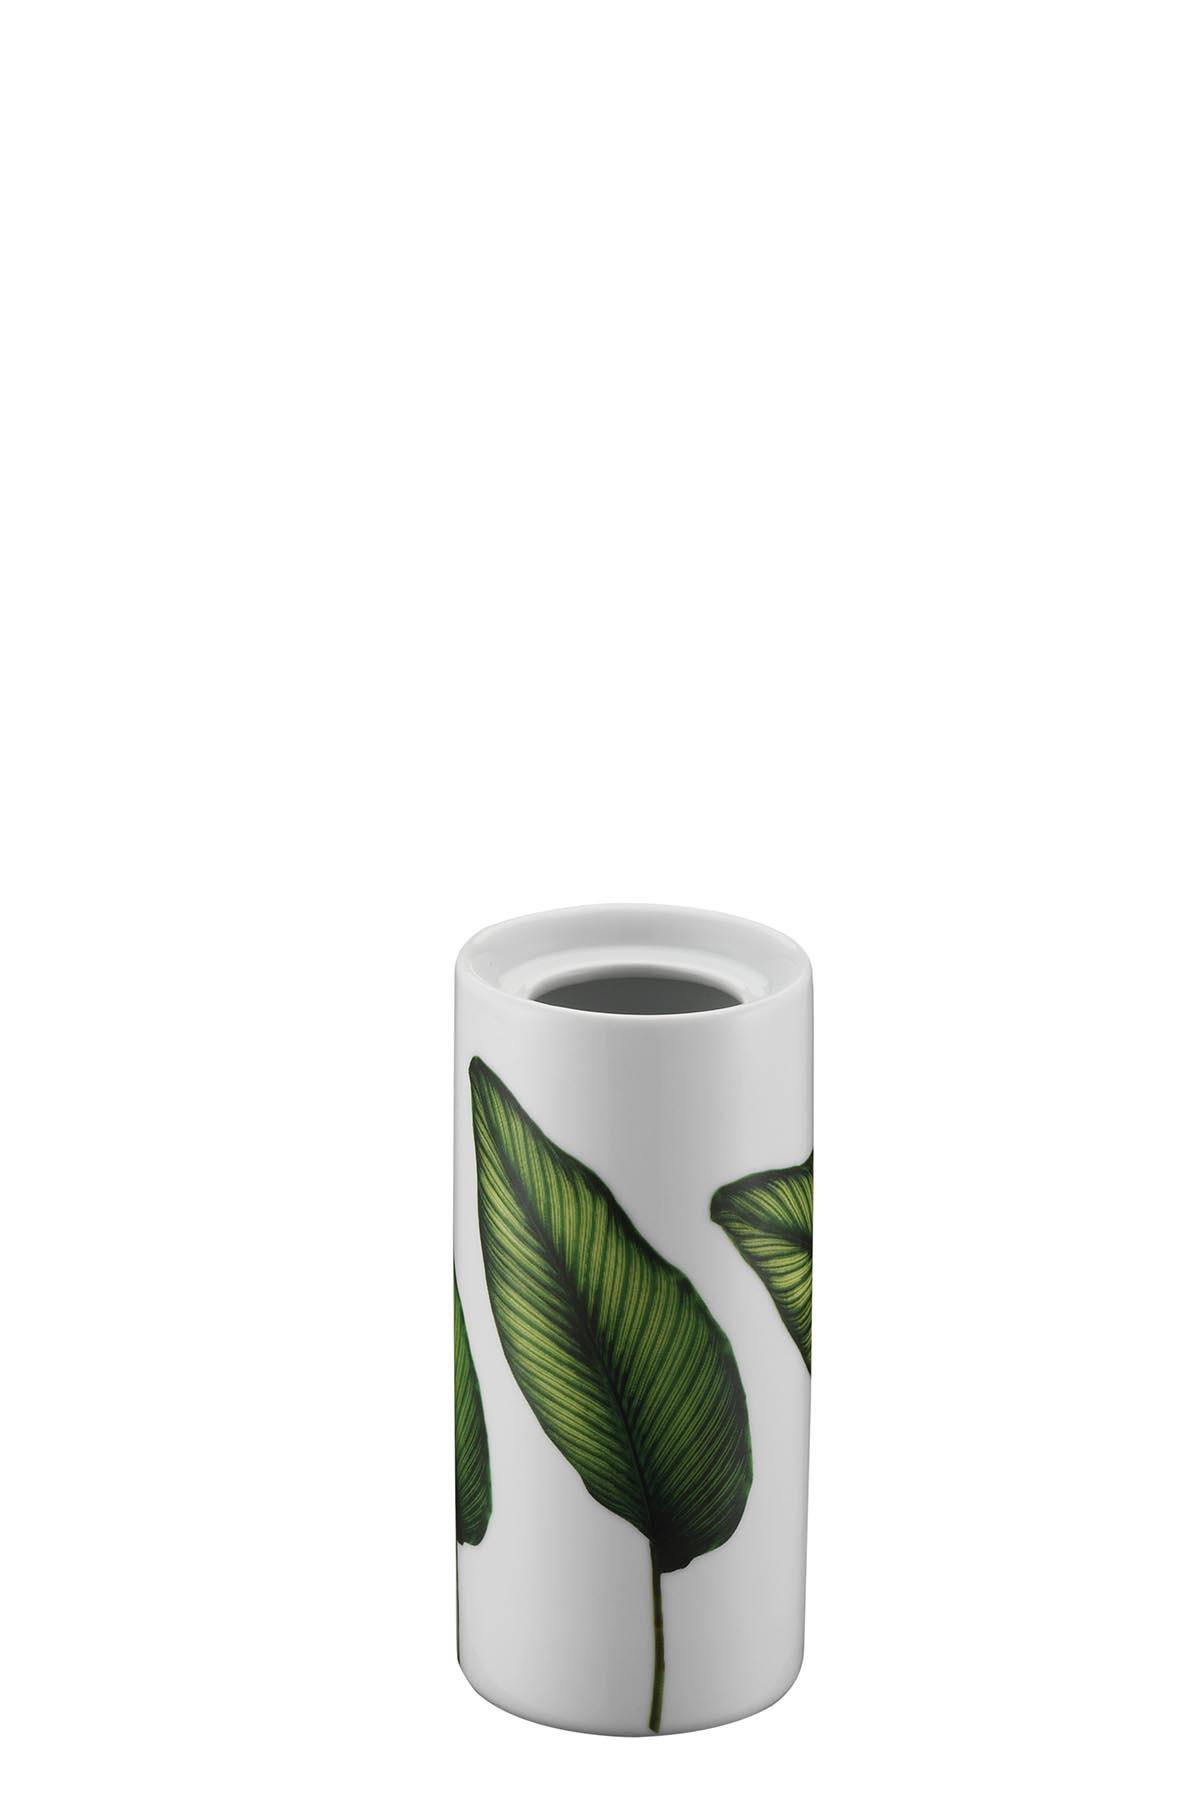 Kütahya Porselen Modern 2 Parça Vazo Takımı 10929